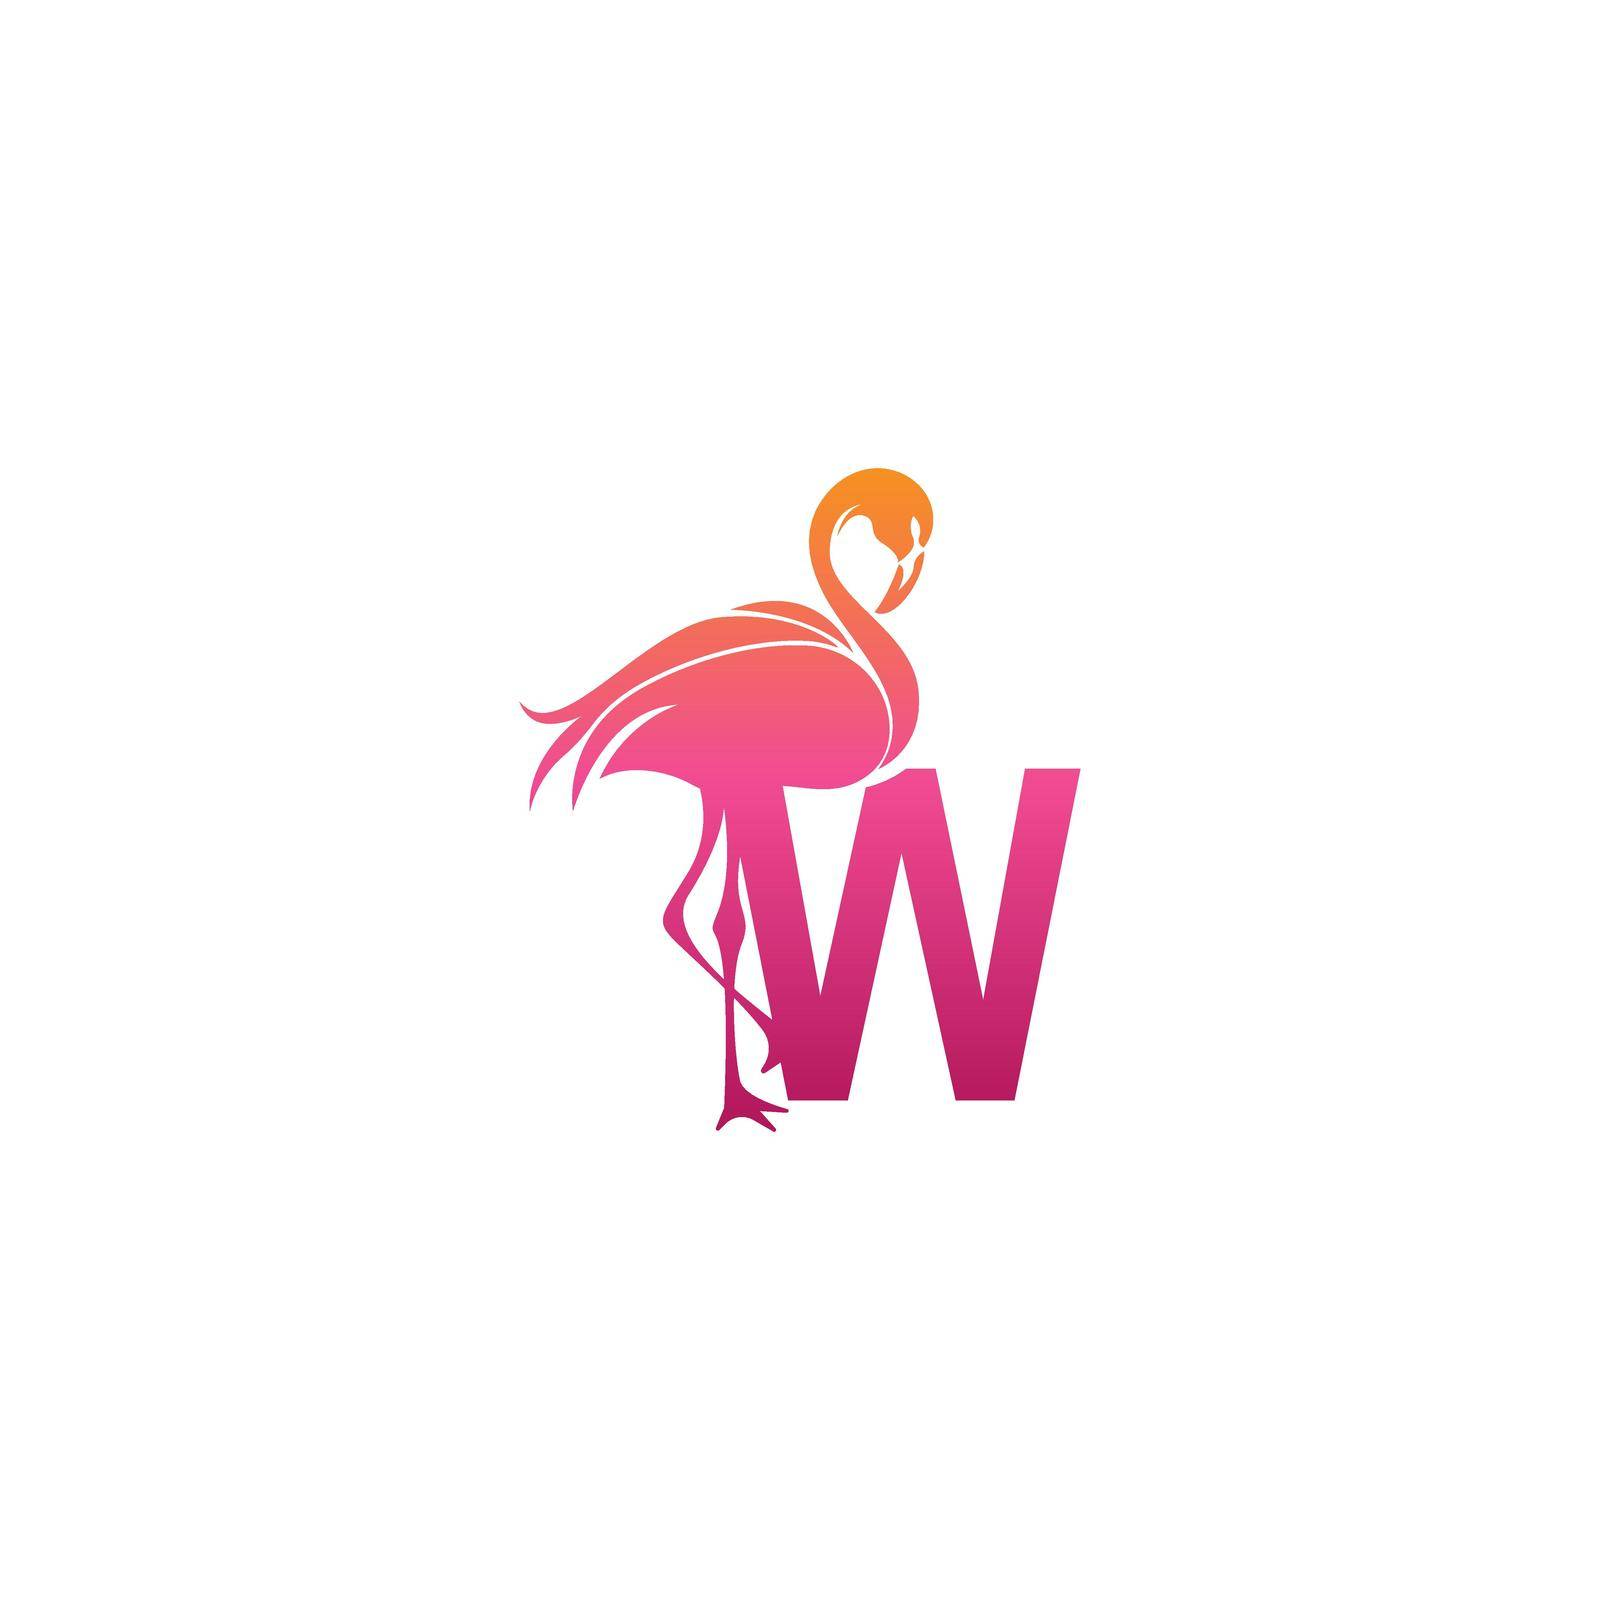 Flamingo bird icon with letter W Logo design vector template